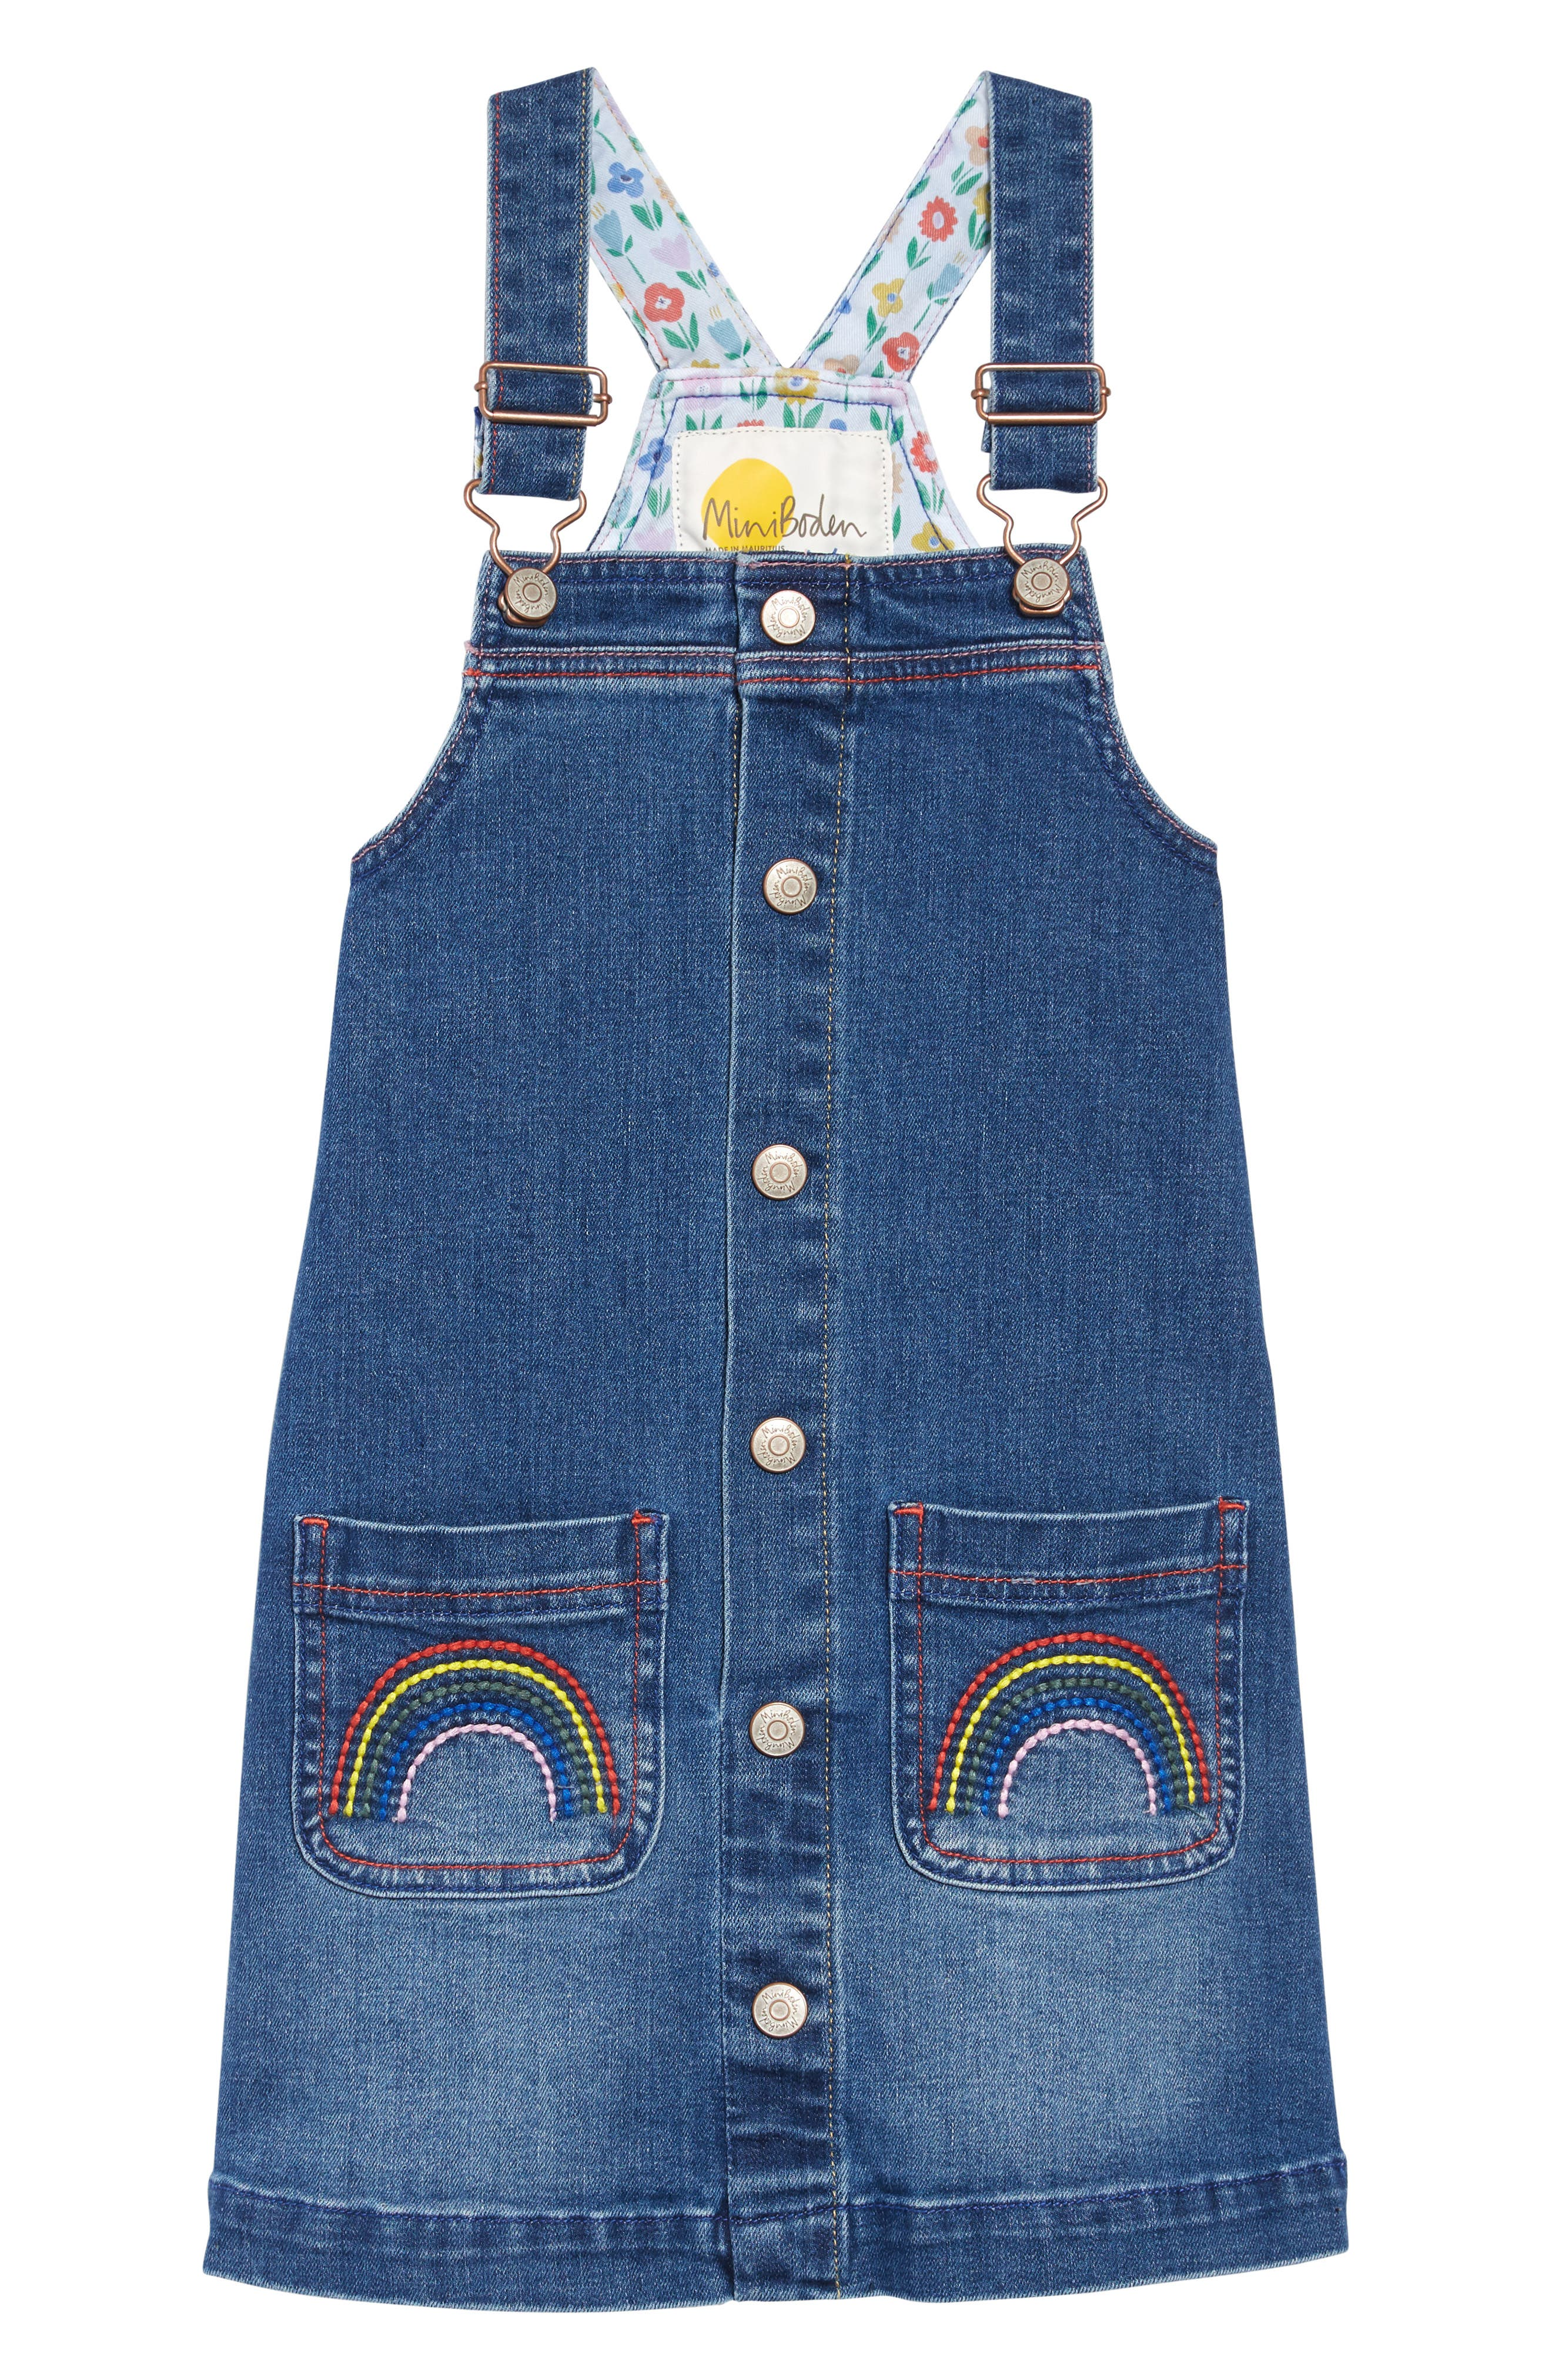 BODEN Mini Boden Denim Dungaree Overall Dress, Main, color, LIGHT VINTAGE BLUE RAINBOWS